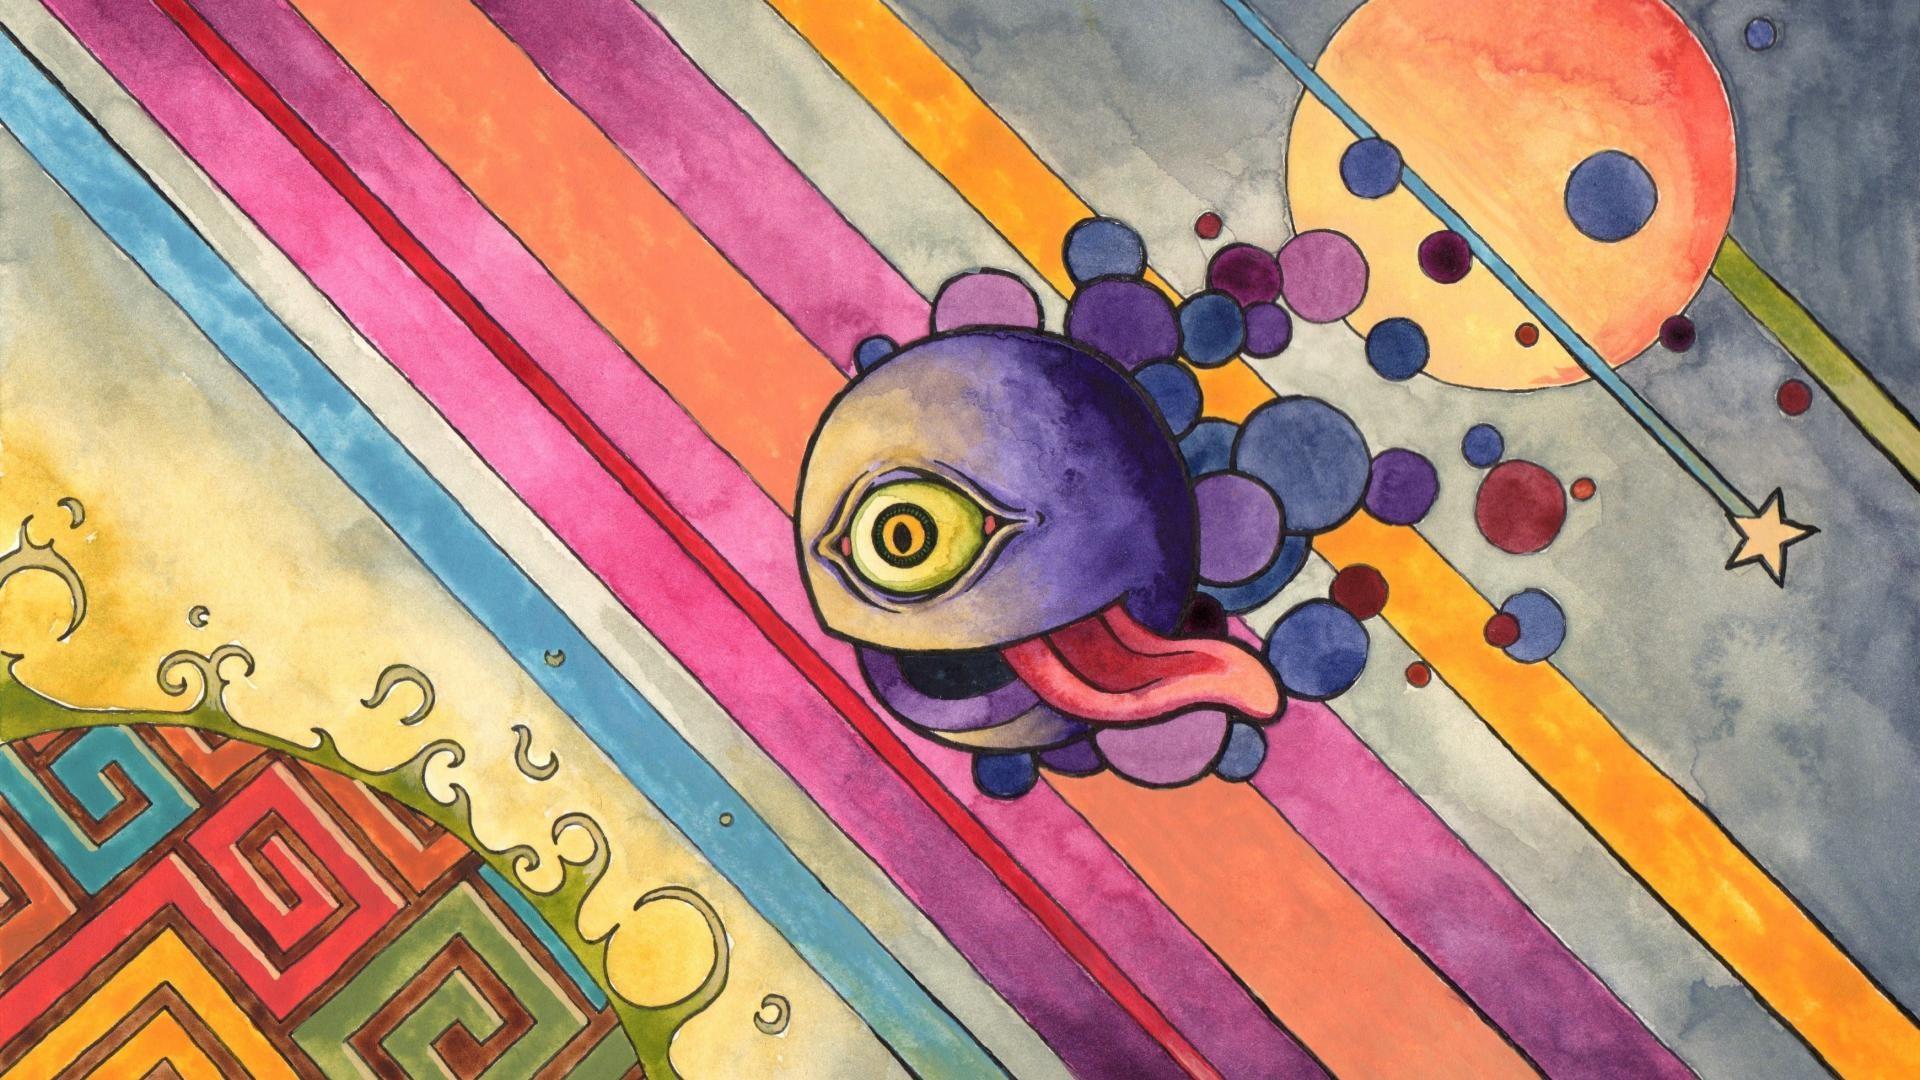 General 1920x1080 colorful digital art abstract lines eyes tongues circle stars psychedelic surreal